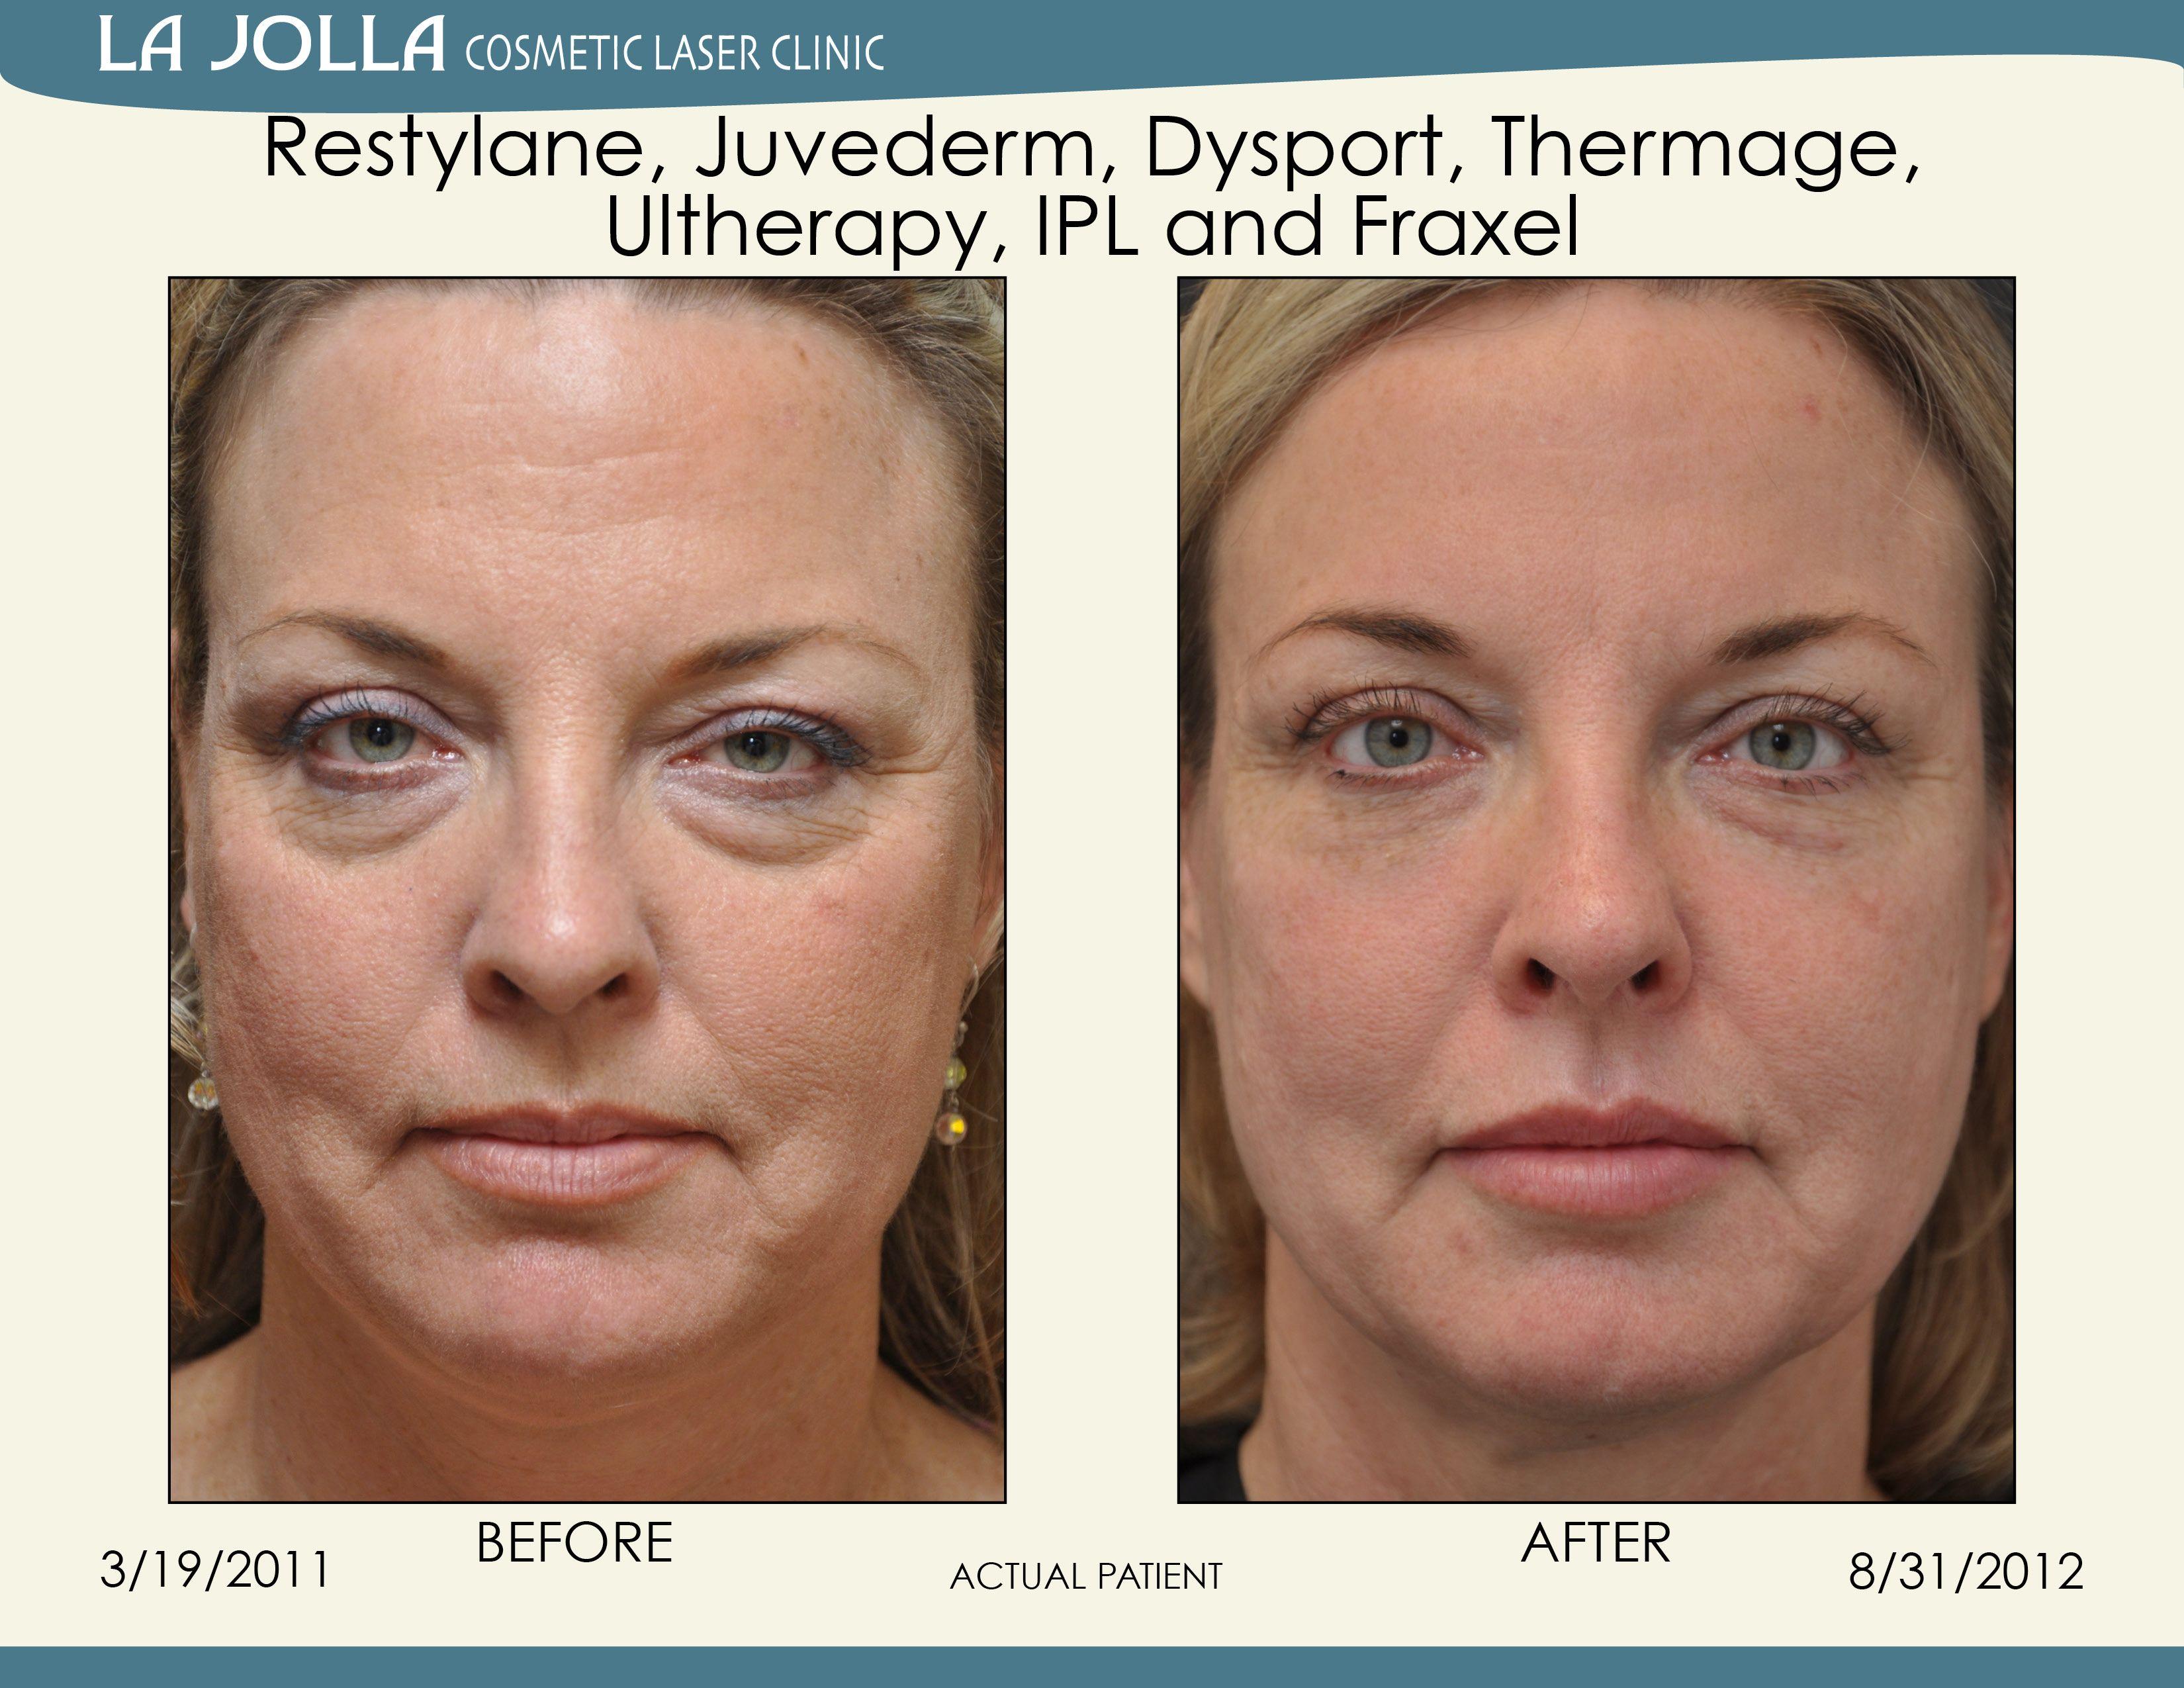 Restyline facial surgery